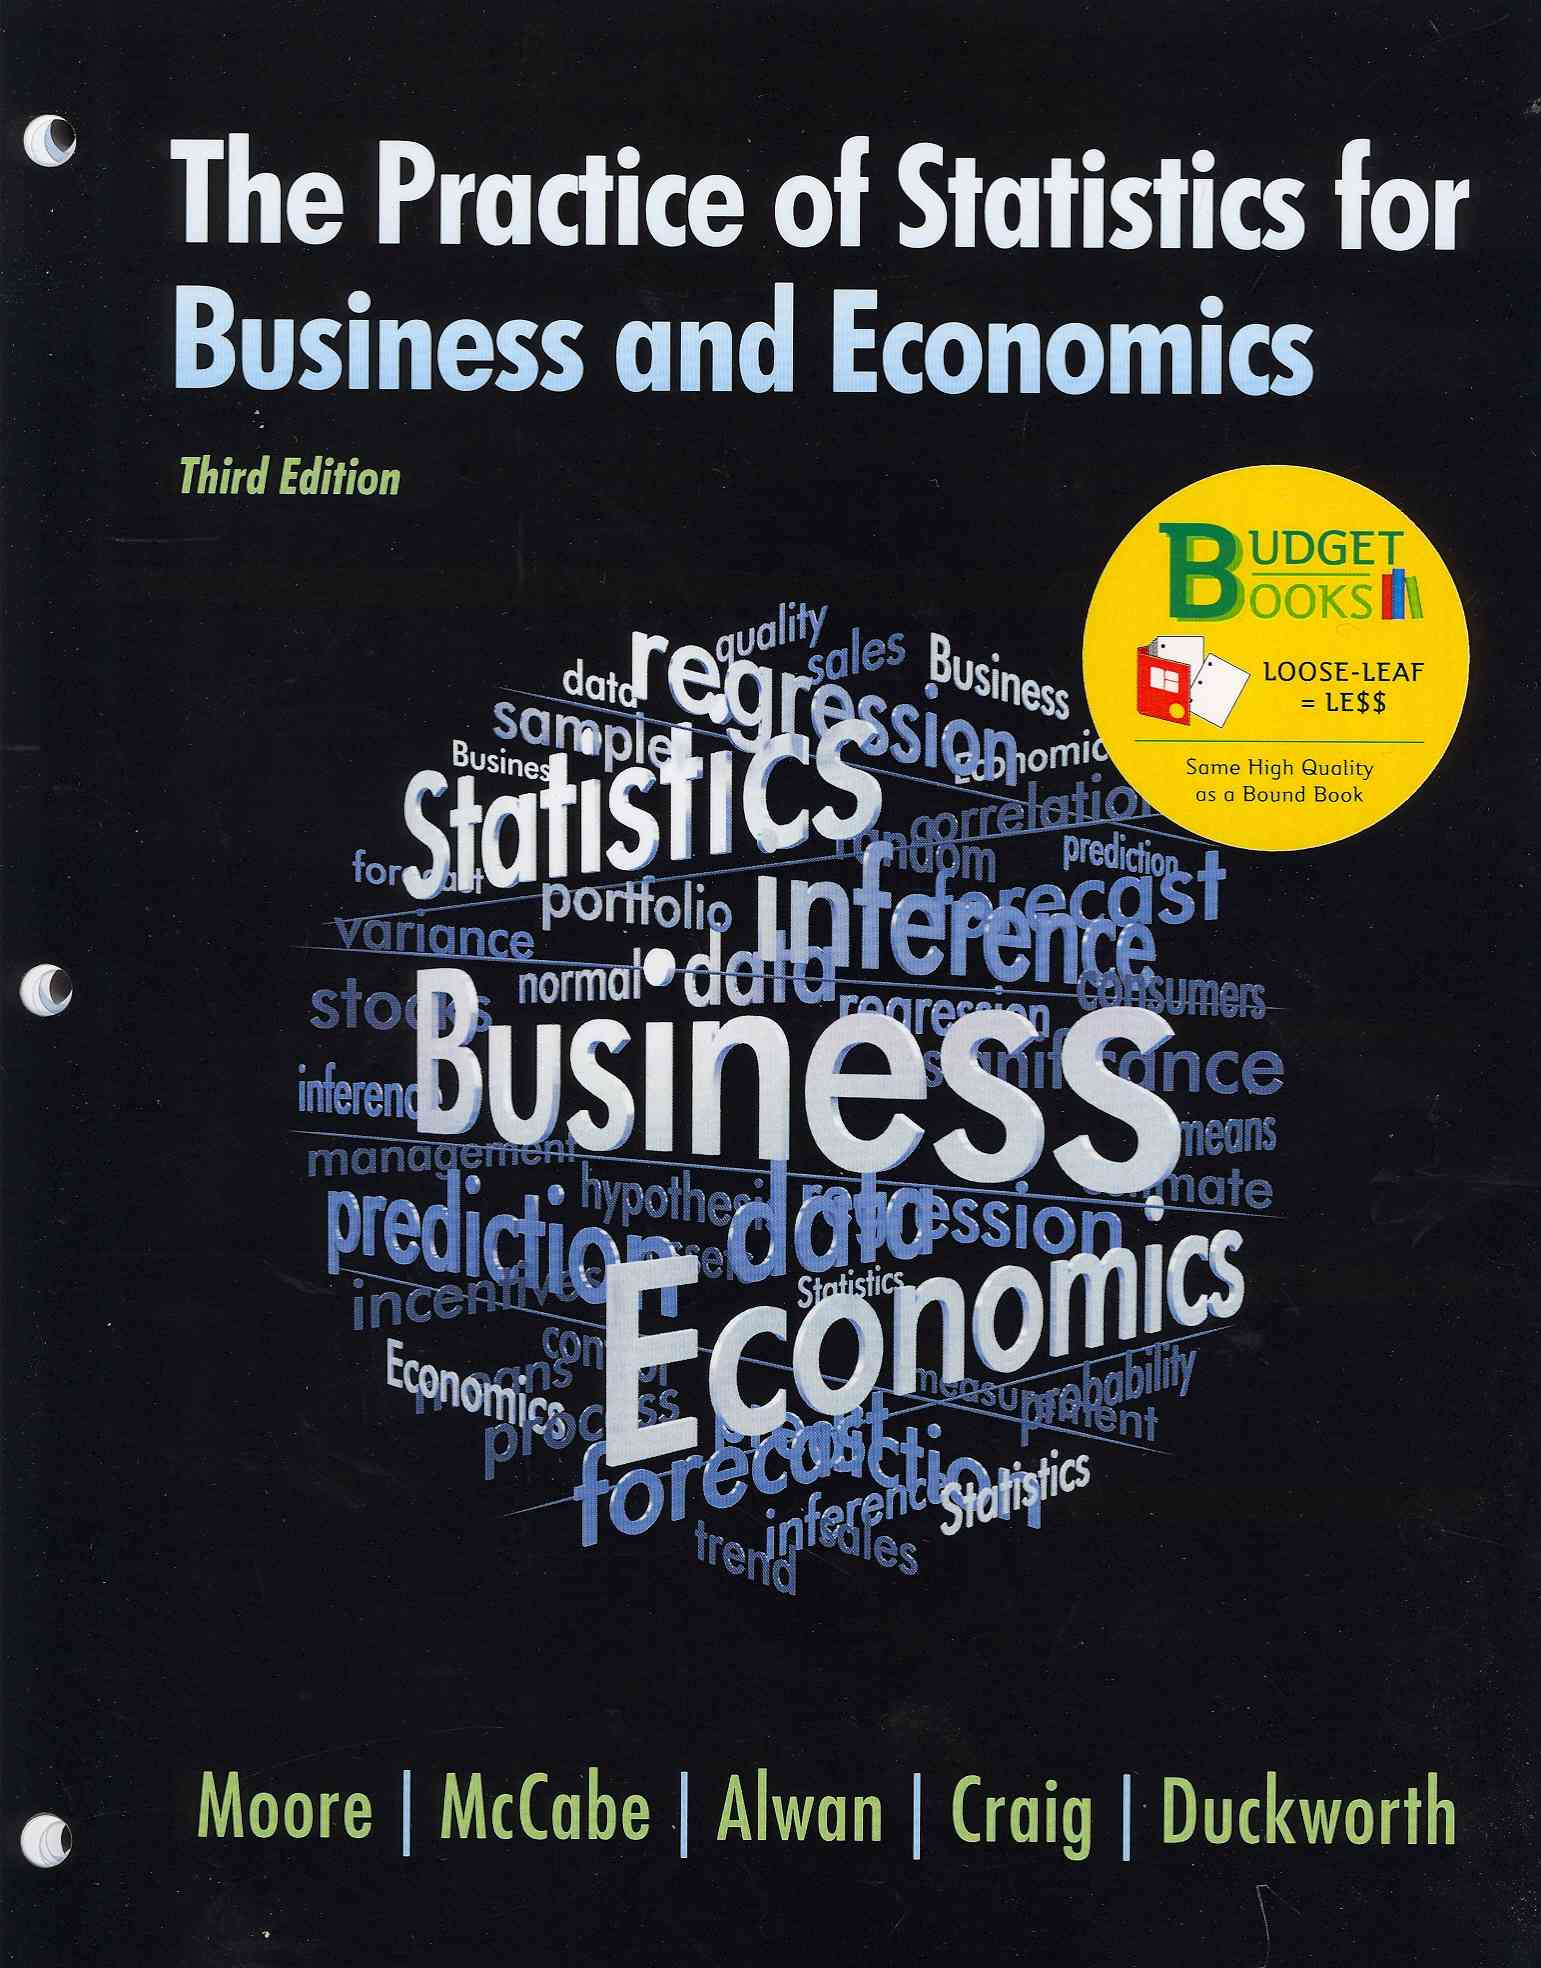 The Practice of Statistics Business and Economics